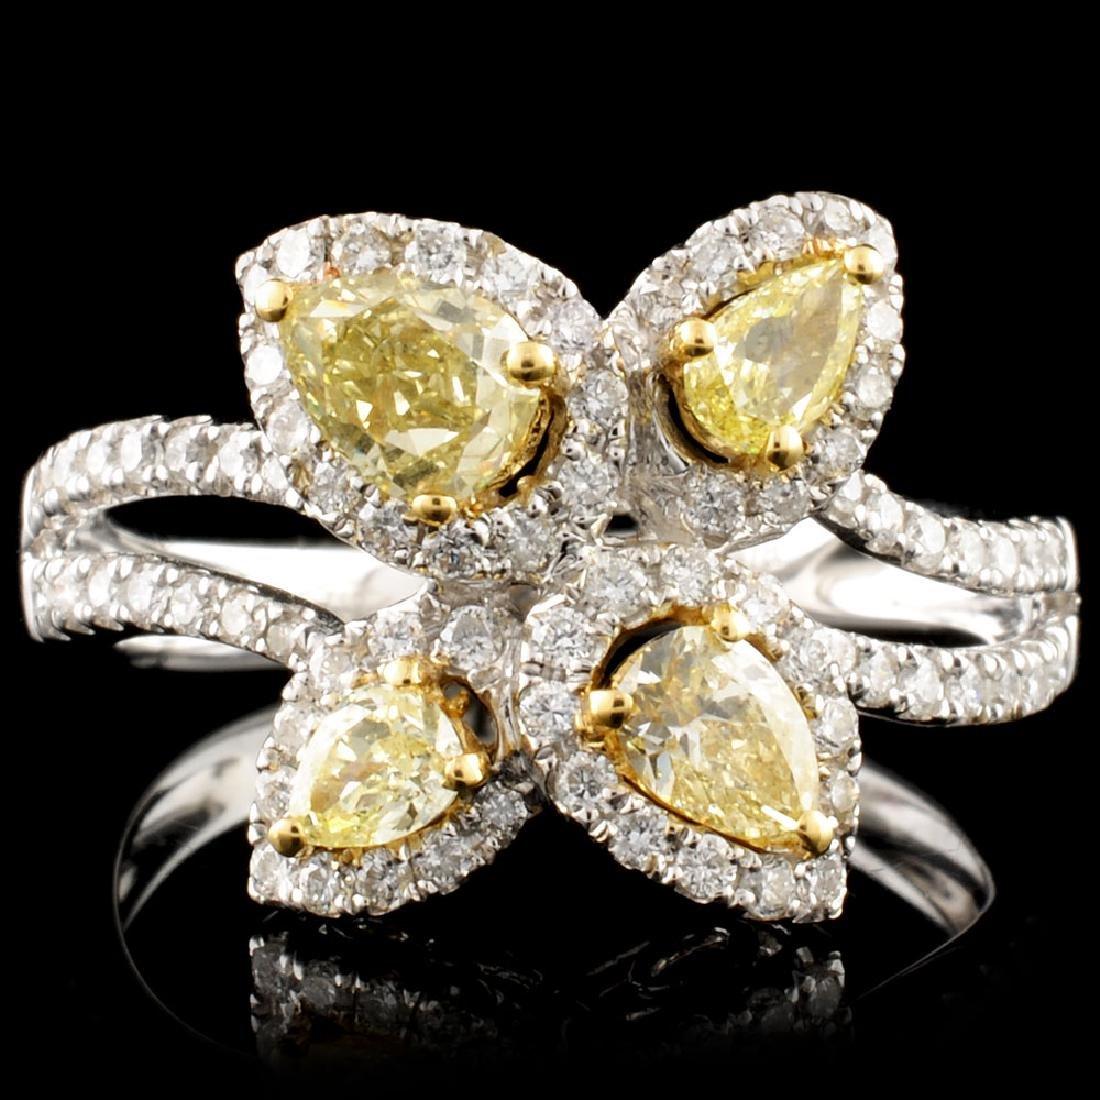 18K Gold 1.22ctw Fancy Diamond Ring